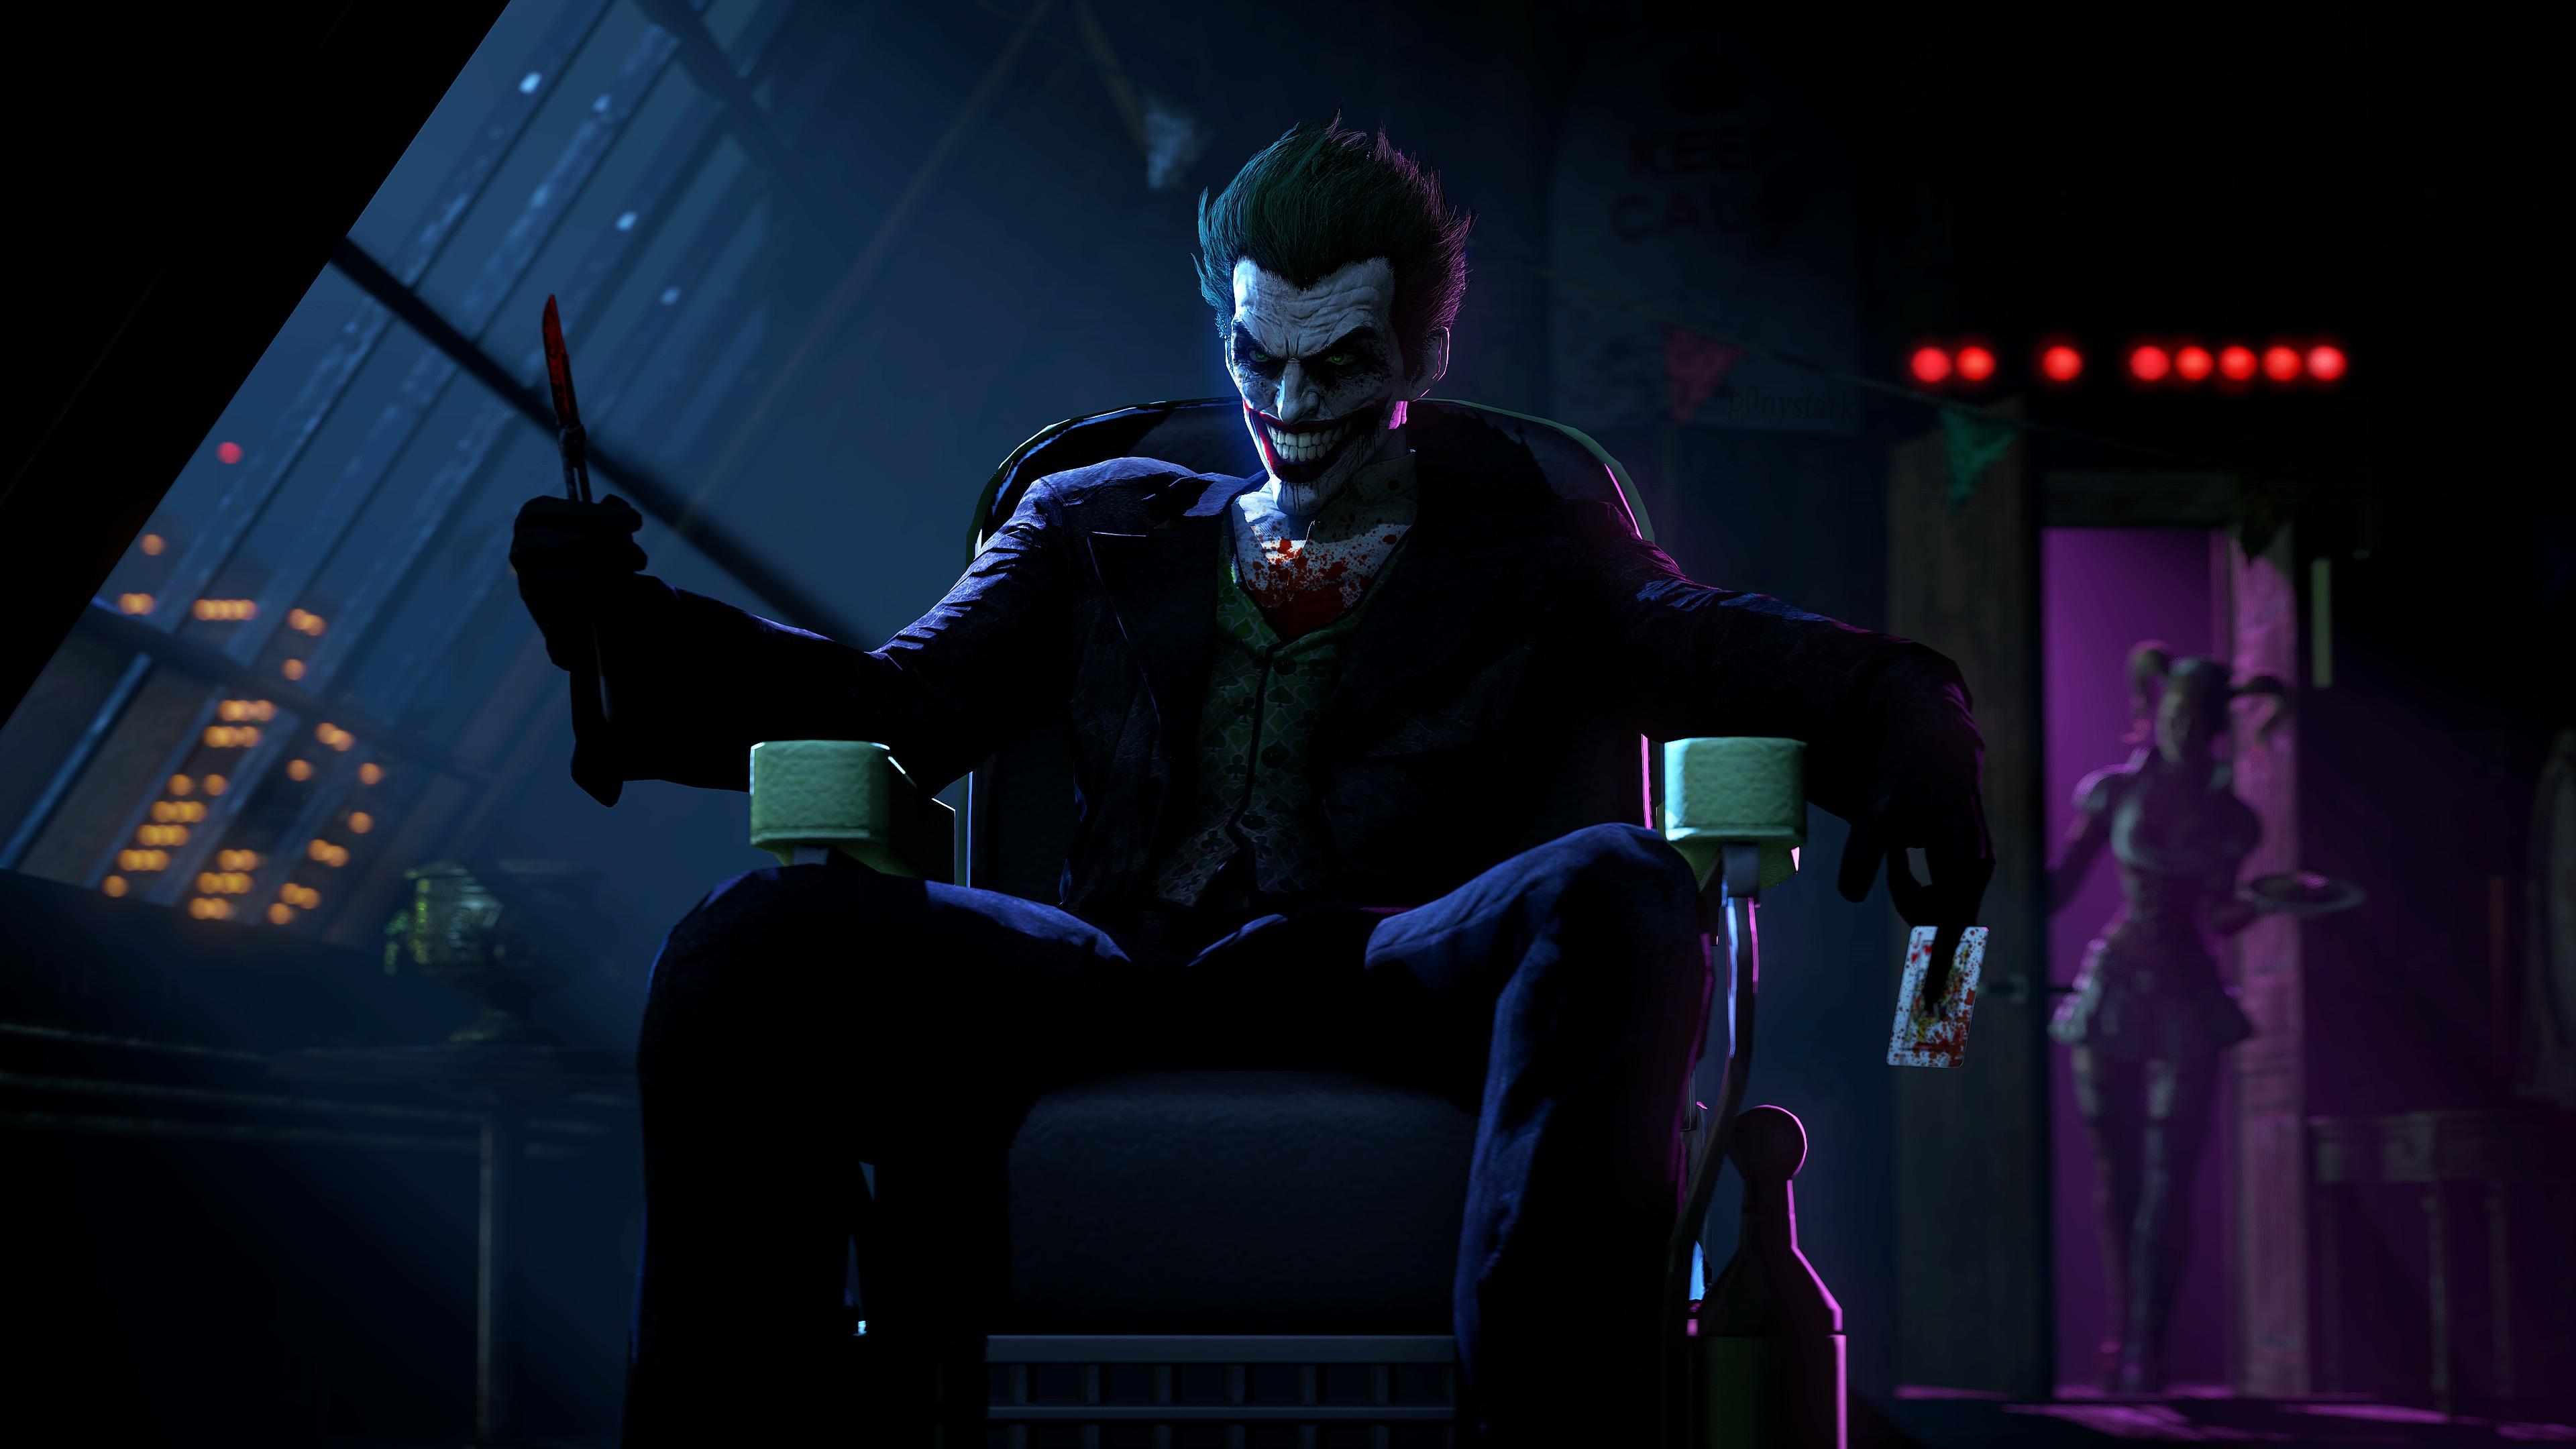 Joker In Batman Arkham Origins, HD Games, 4k Wallpapers